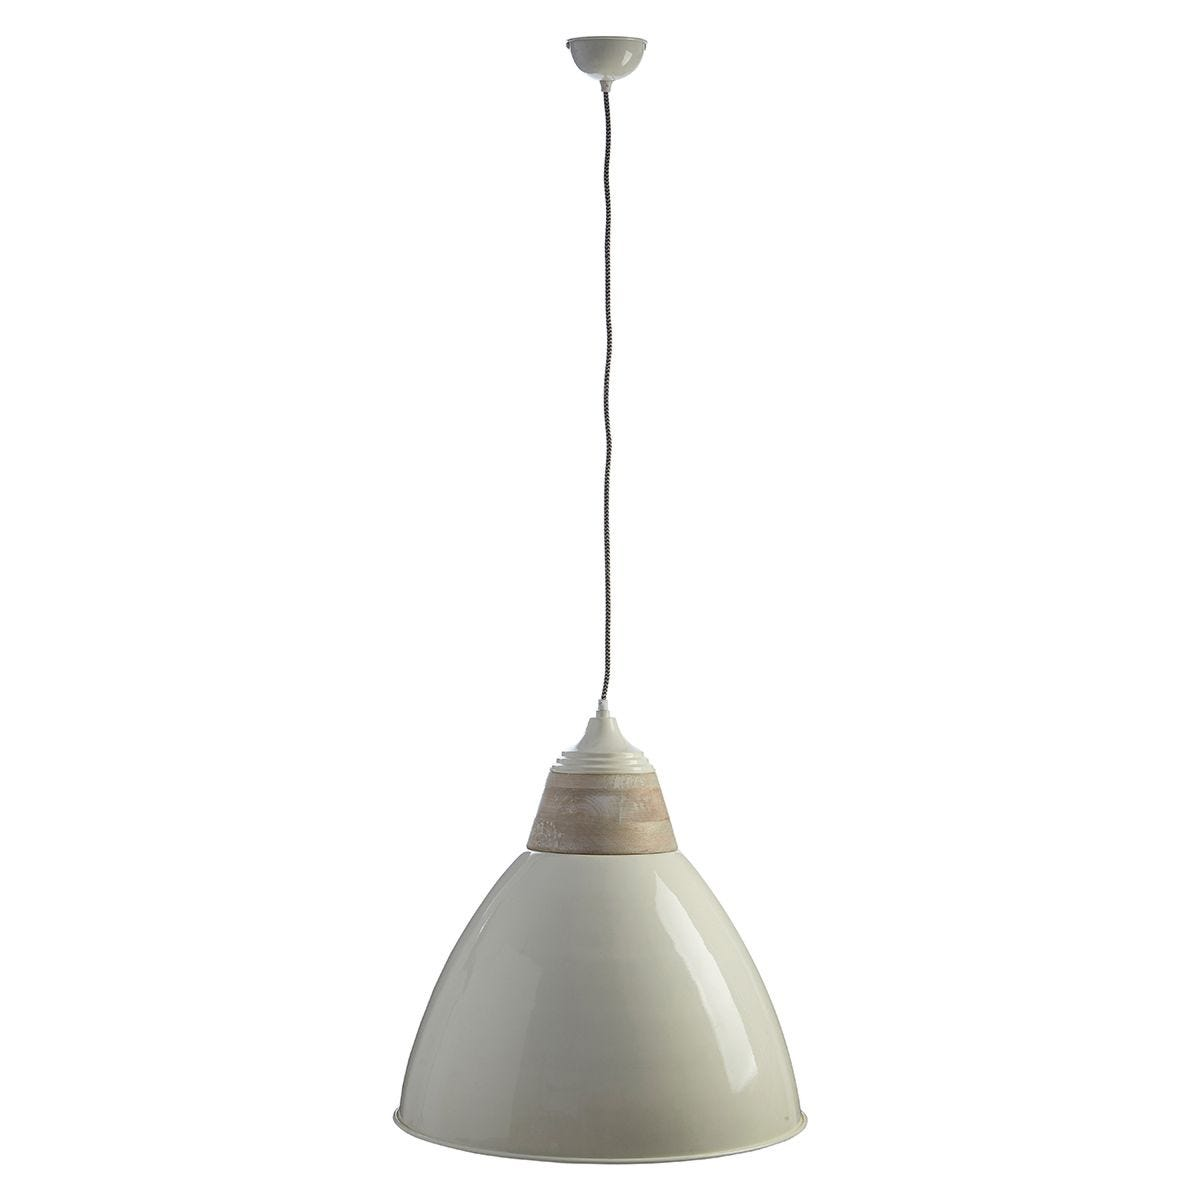 Premier Housewares Oslo Extra Large Pendant Light in Iron/Wood - White